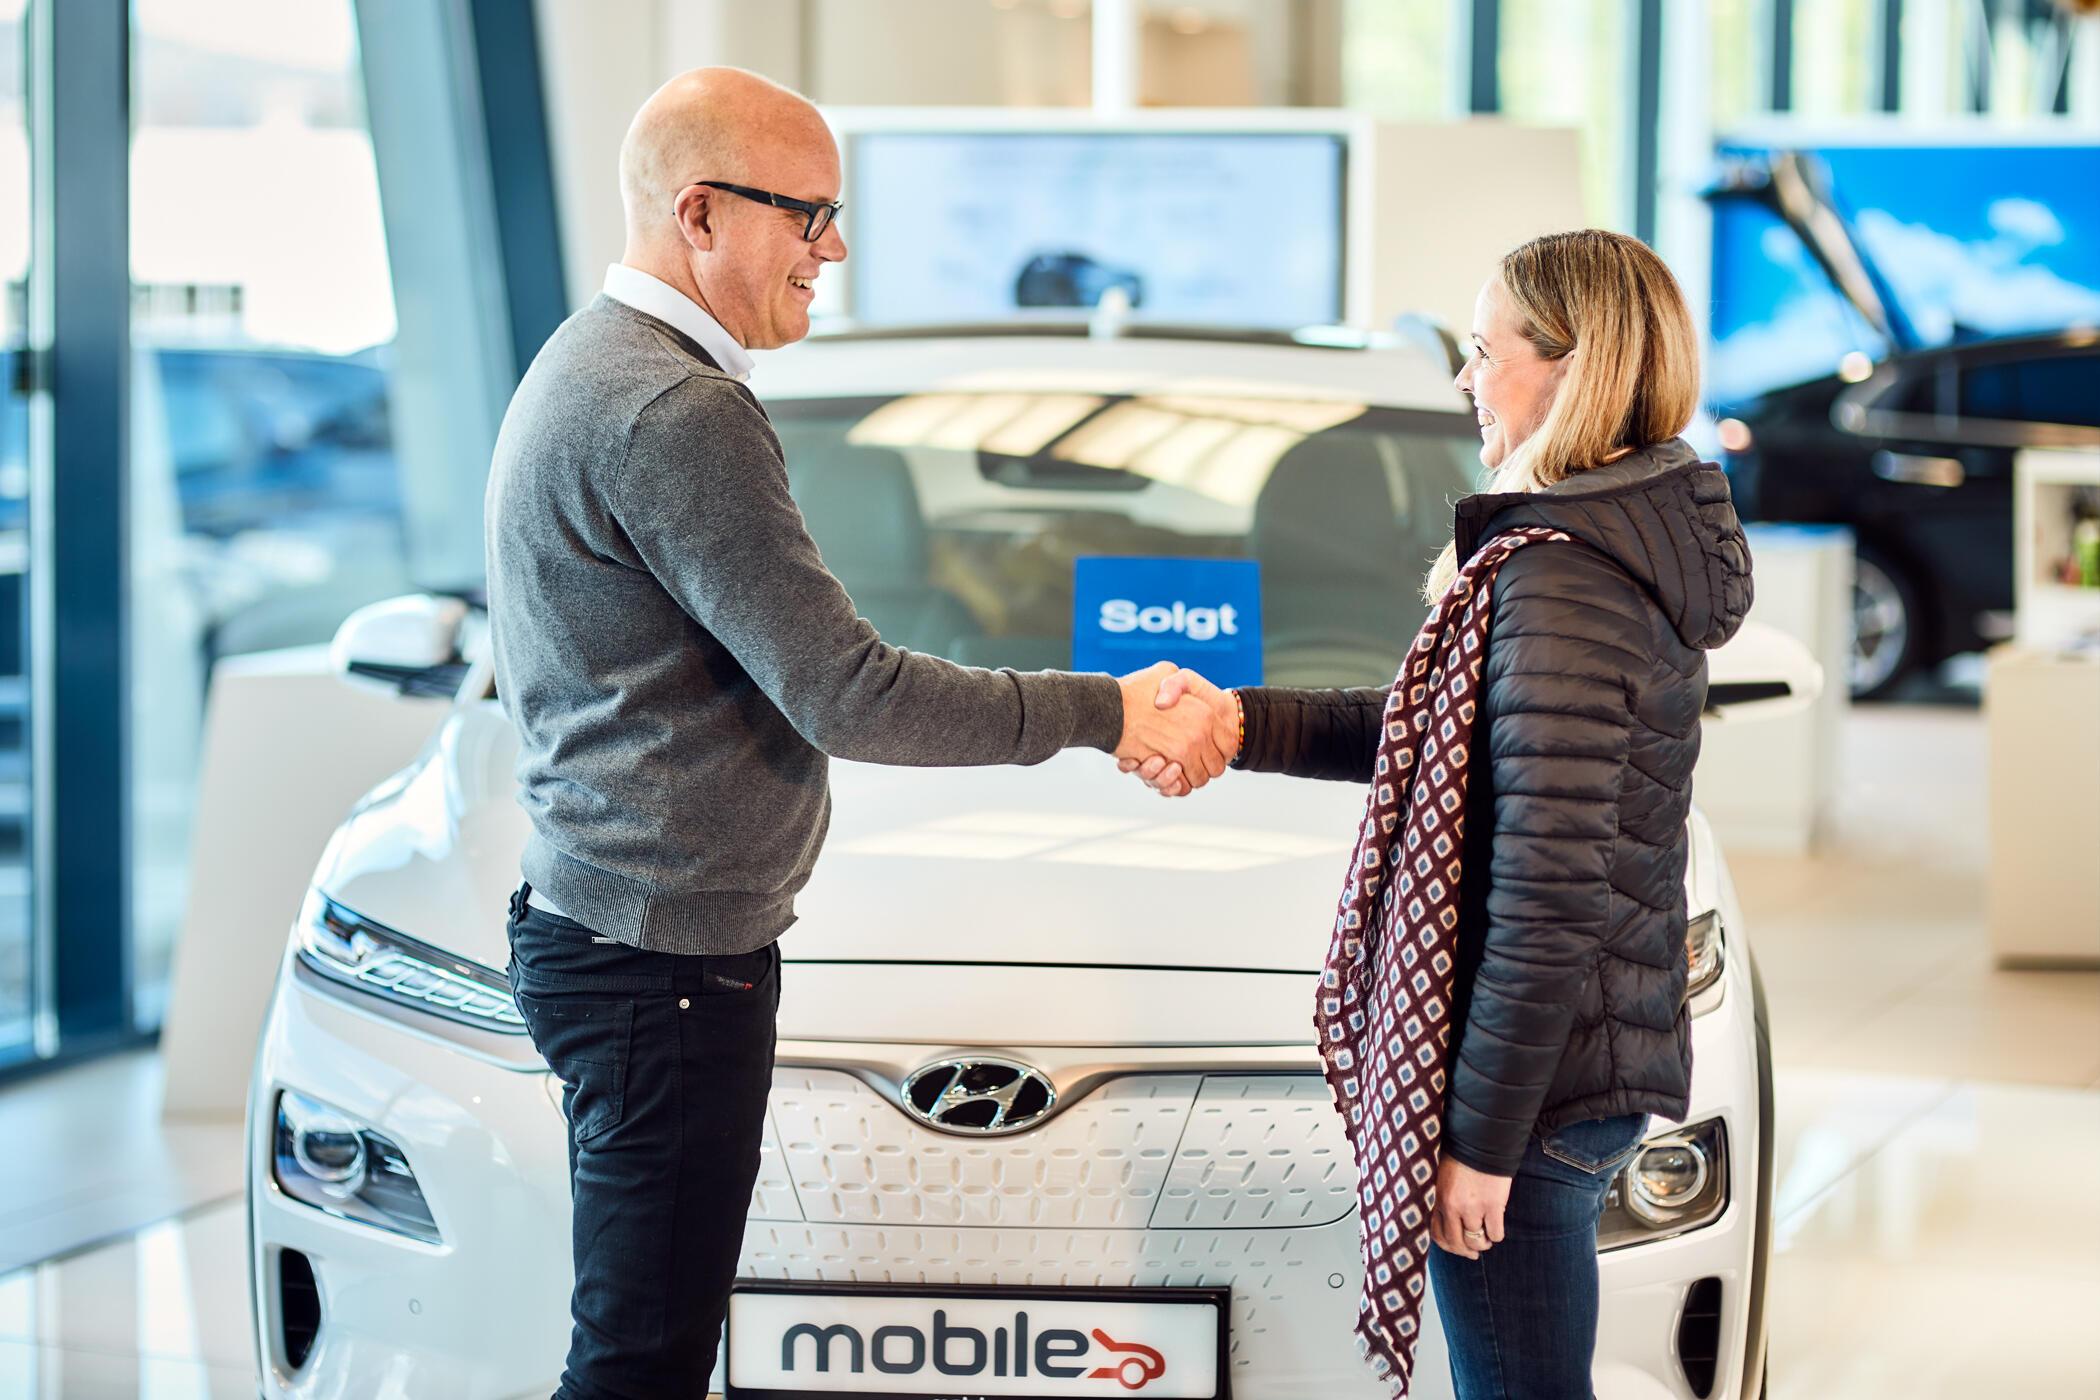 Car salesman closes deal with customer